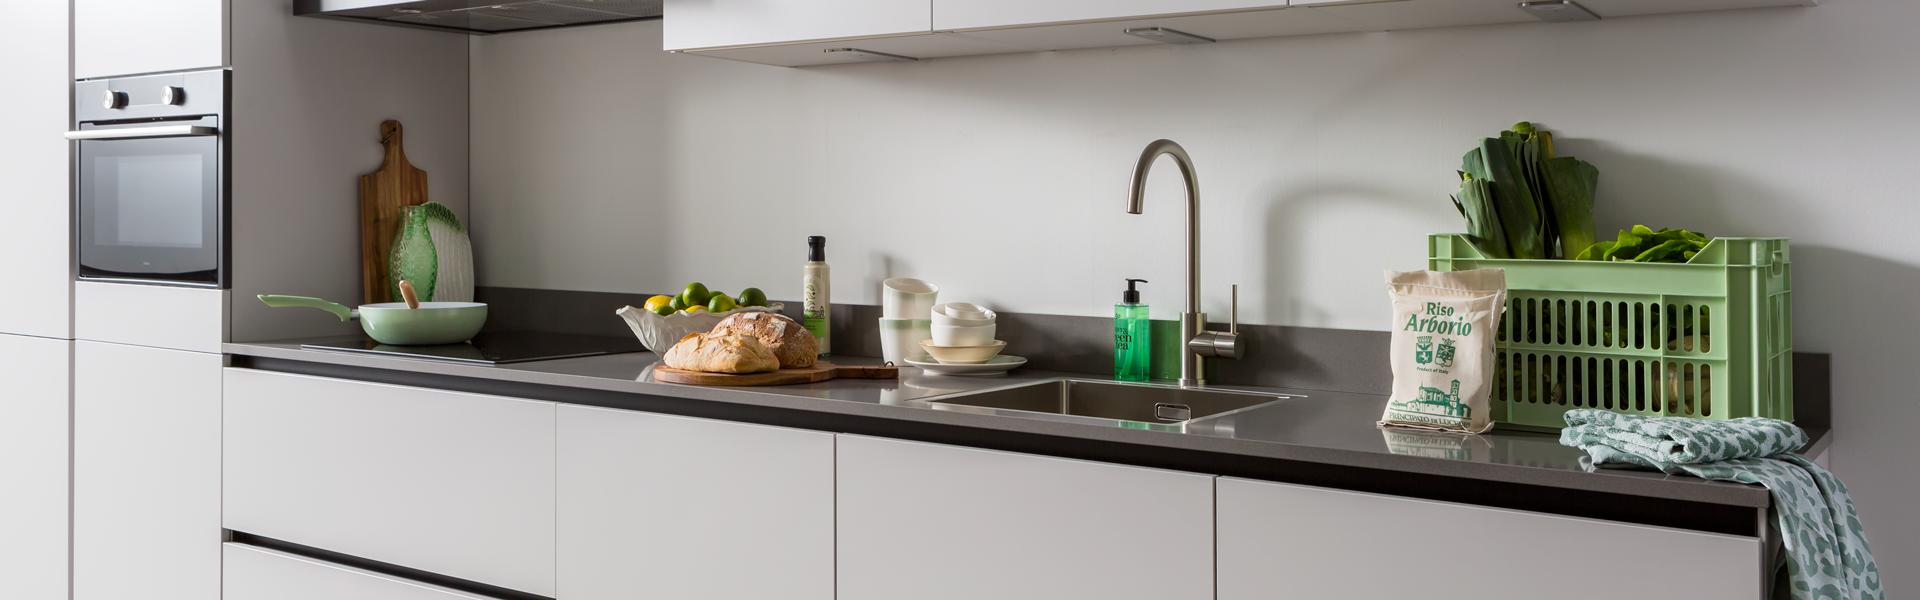 Luxe witte keukens | Eigenhuis Keukens